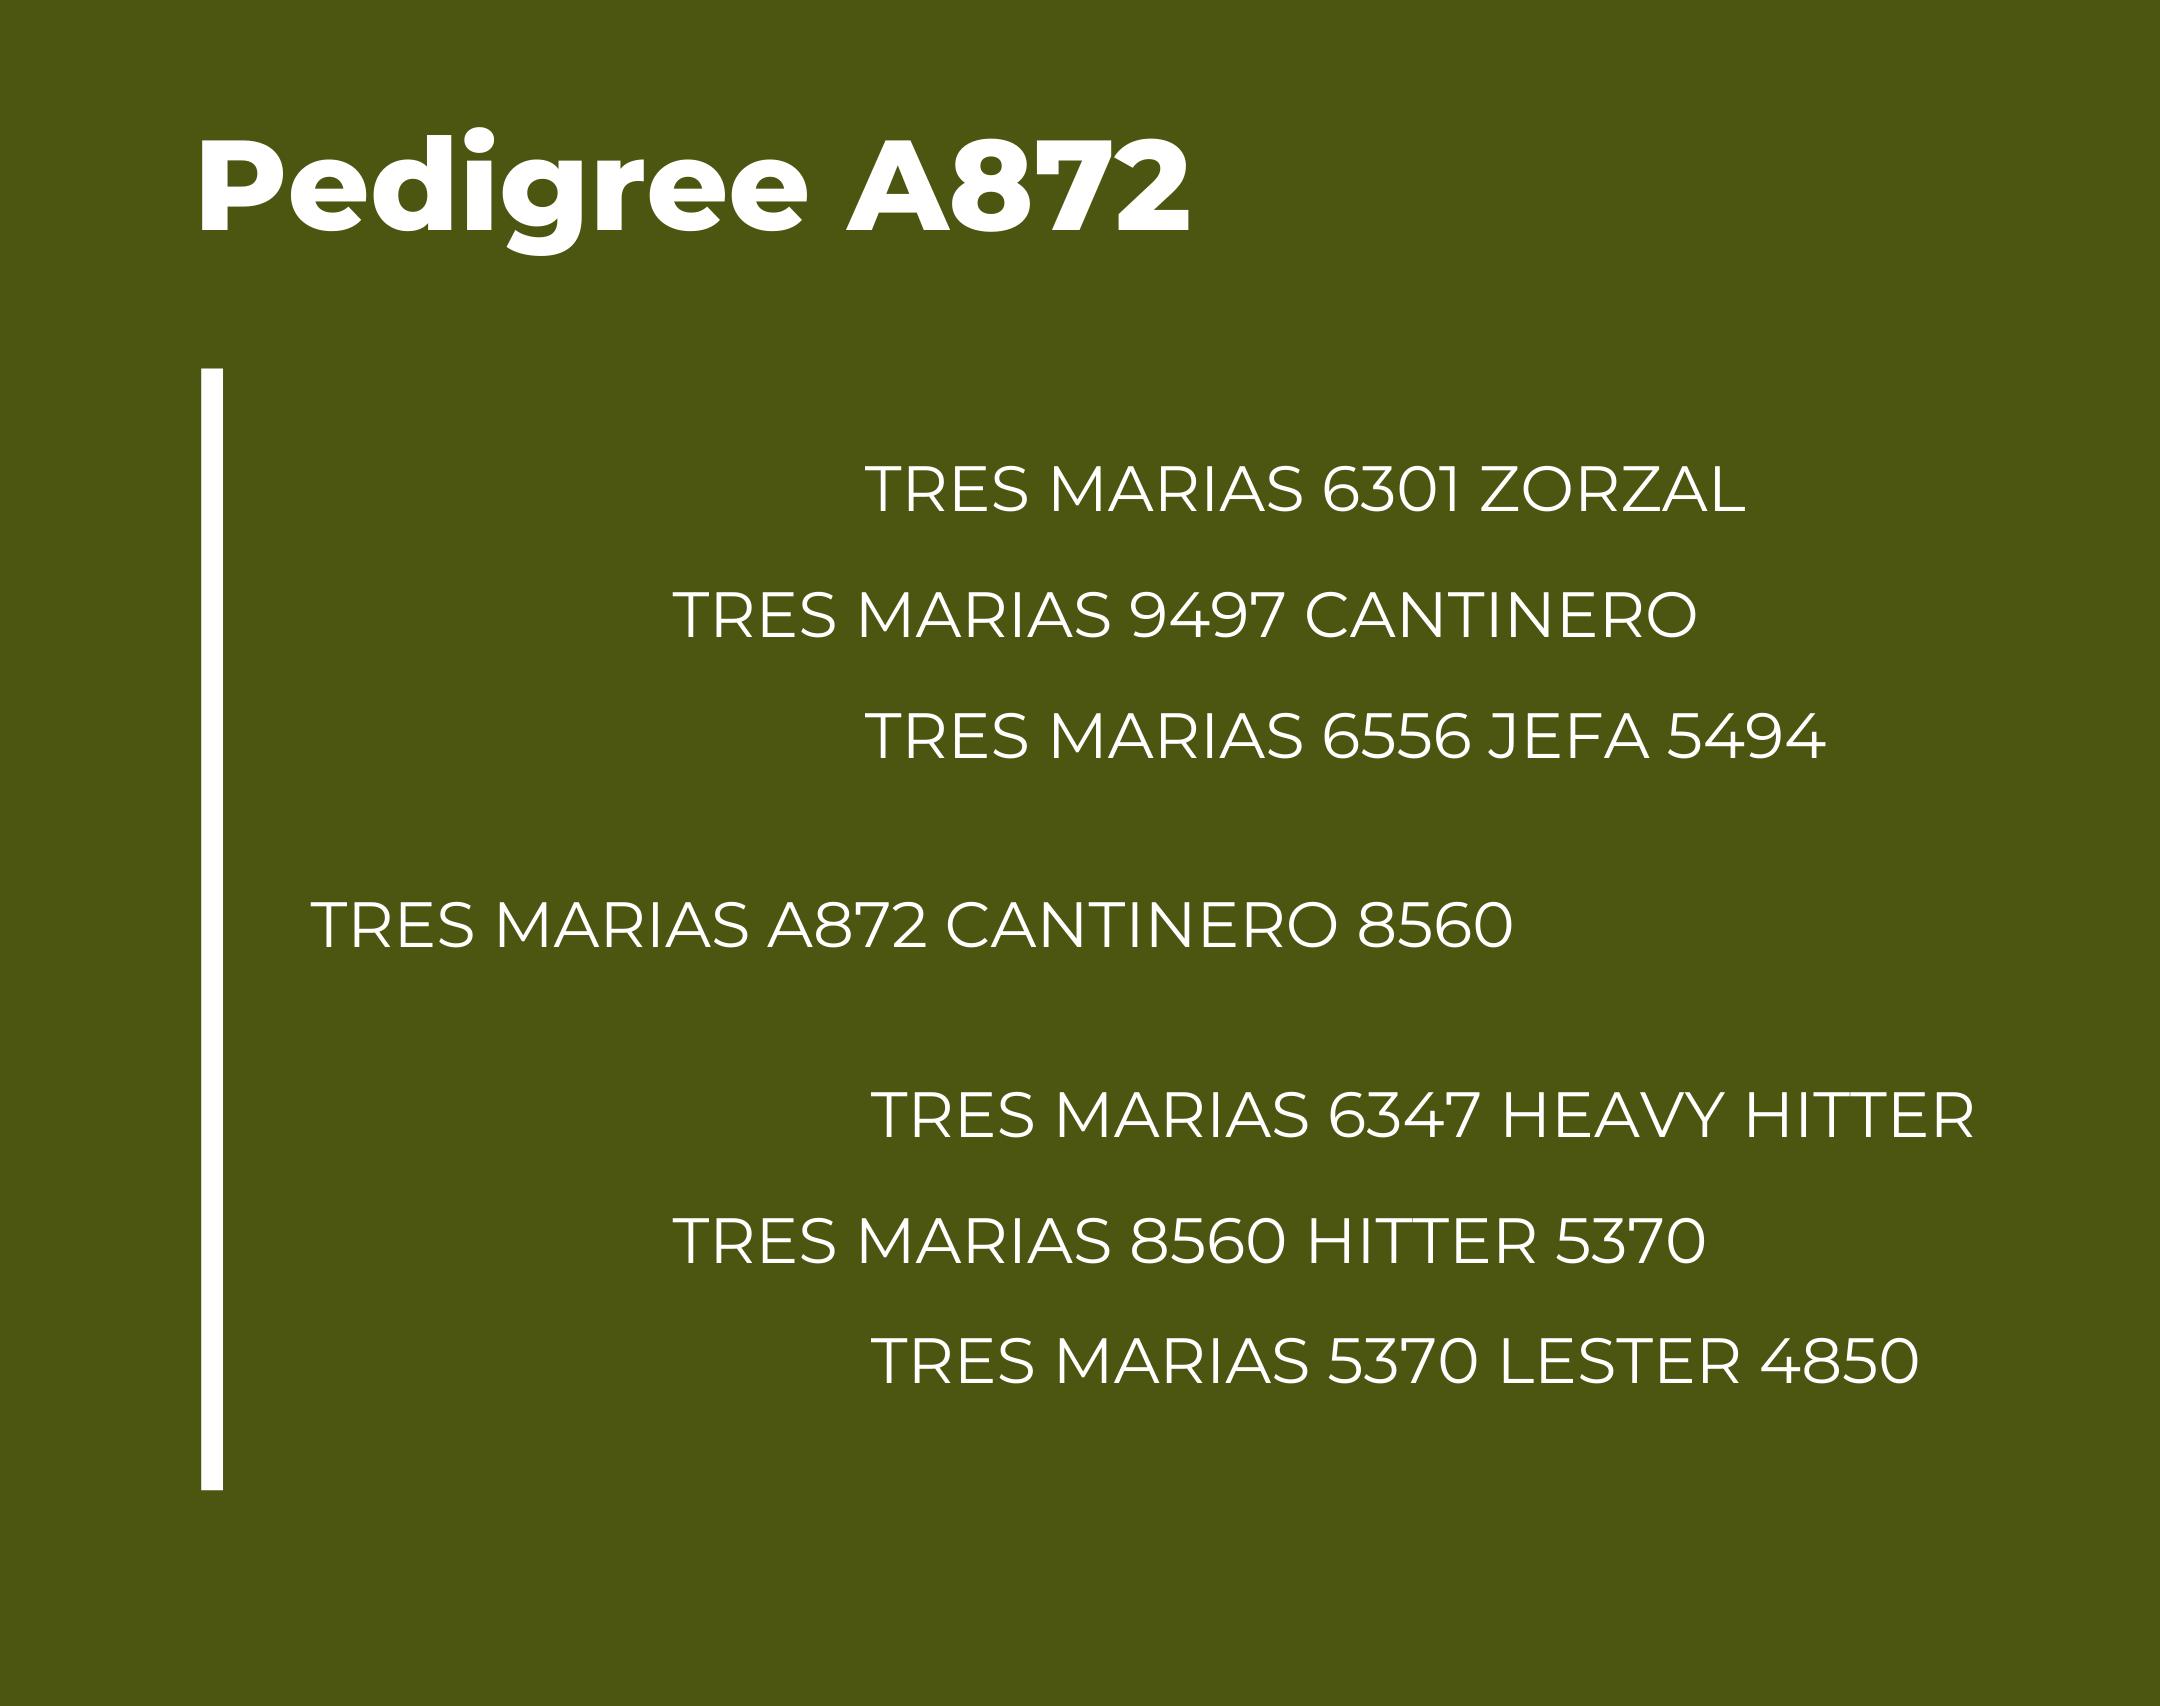 Tres Marias A872